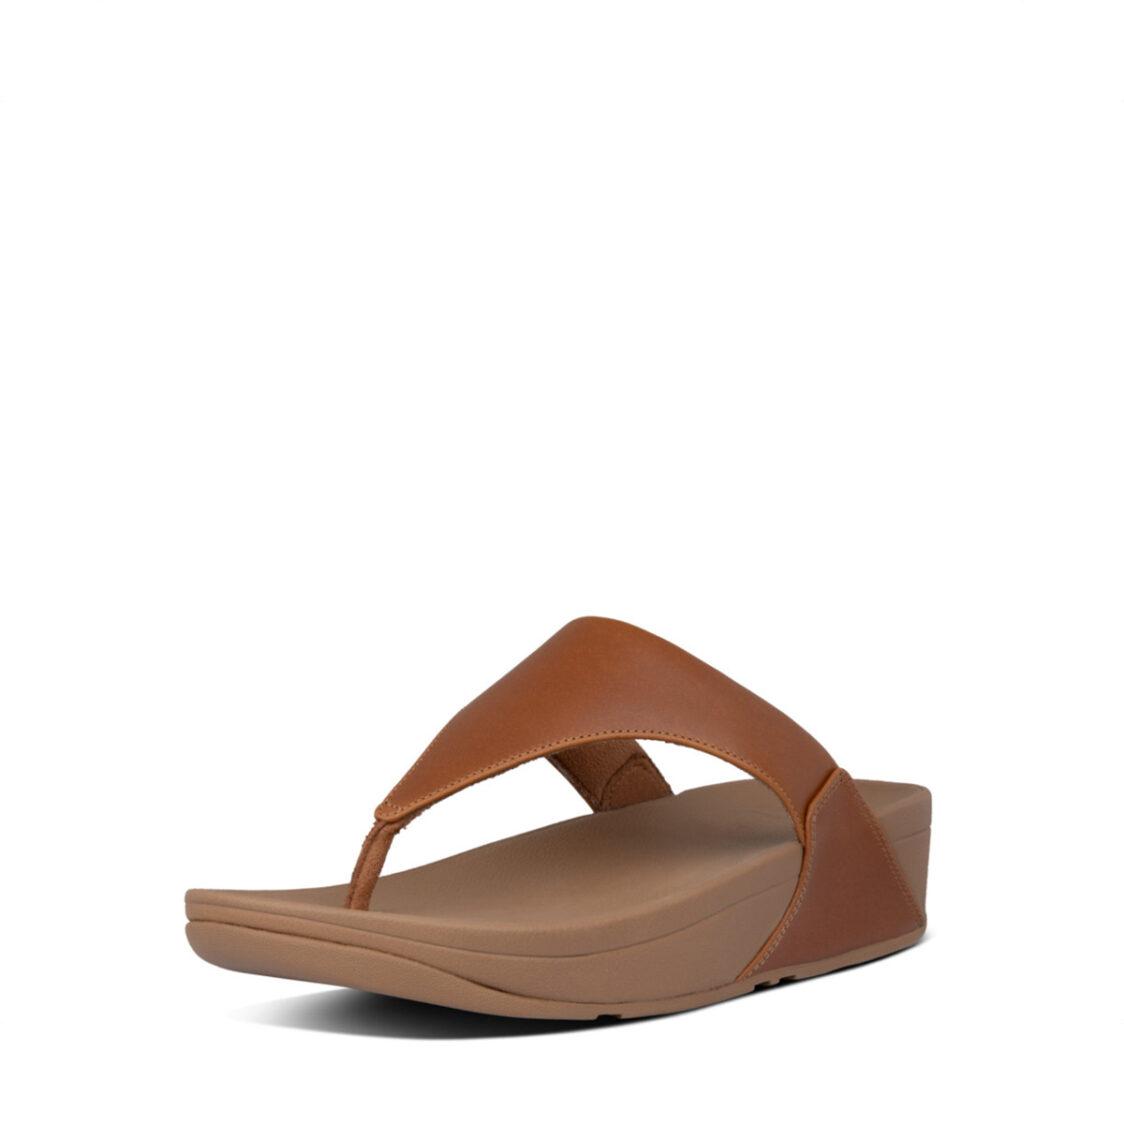 Fitflop Lulu Leather Toepost Light Tan I88-592